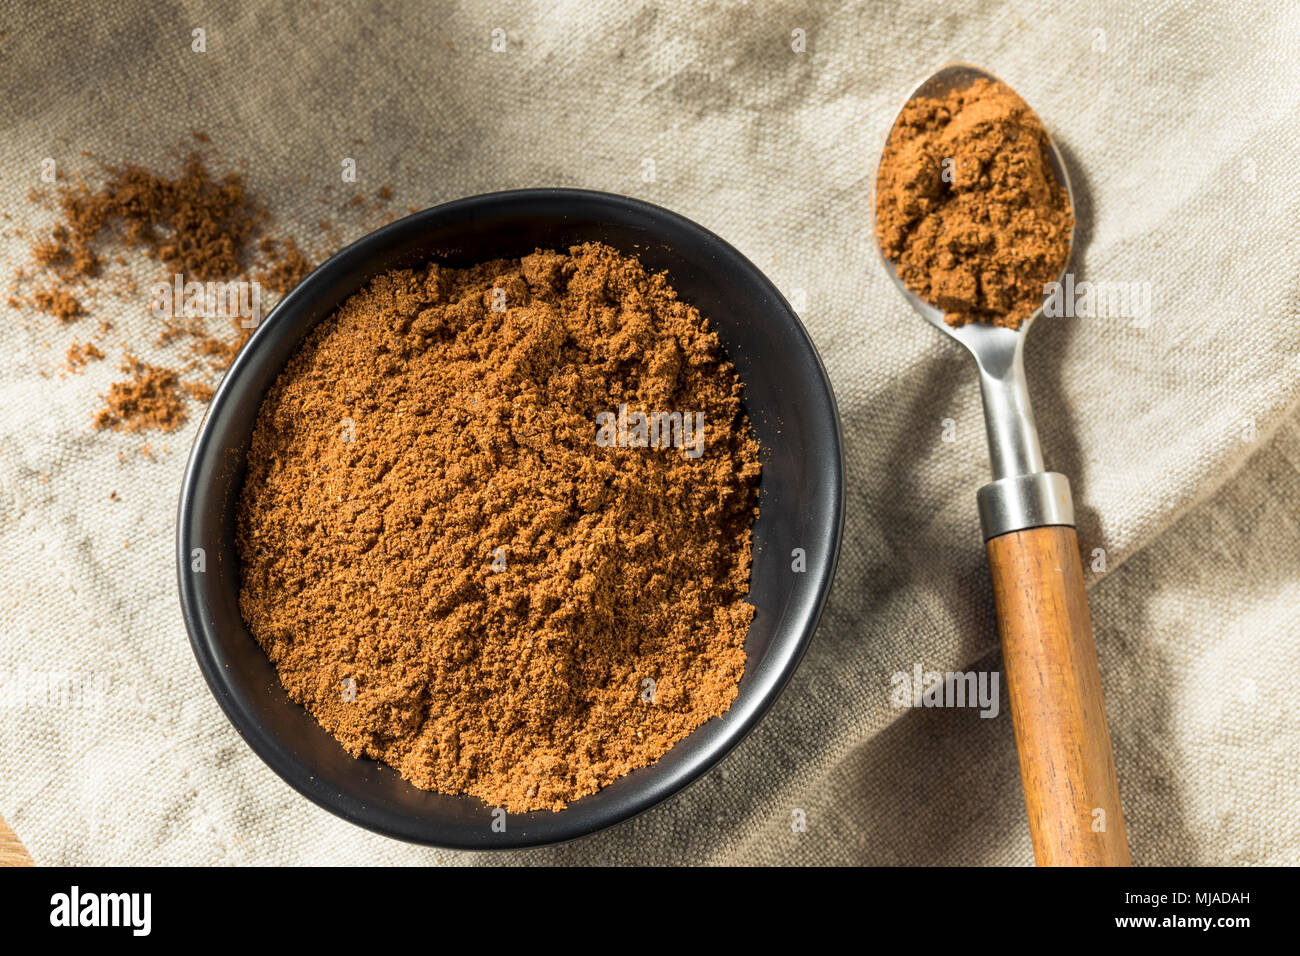 Organic Garam Masala Indian Spice in a Bowl - Stock Image